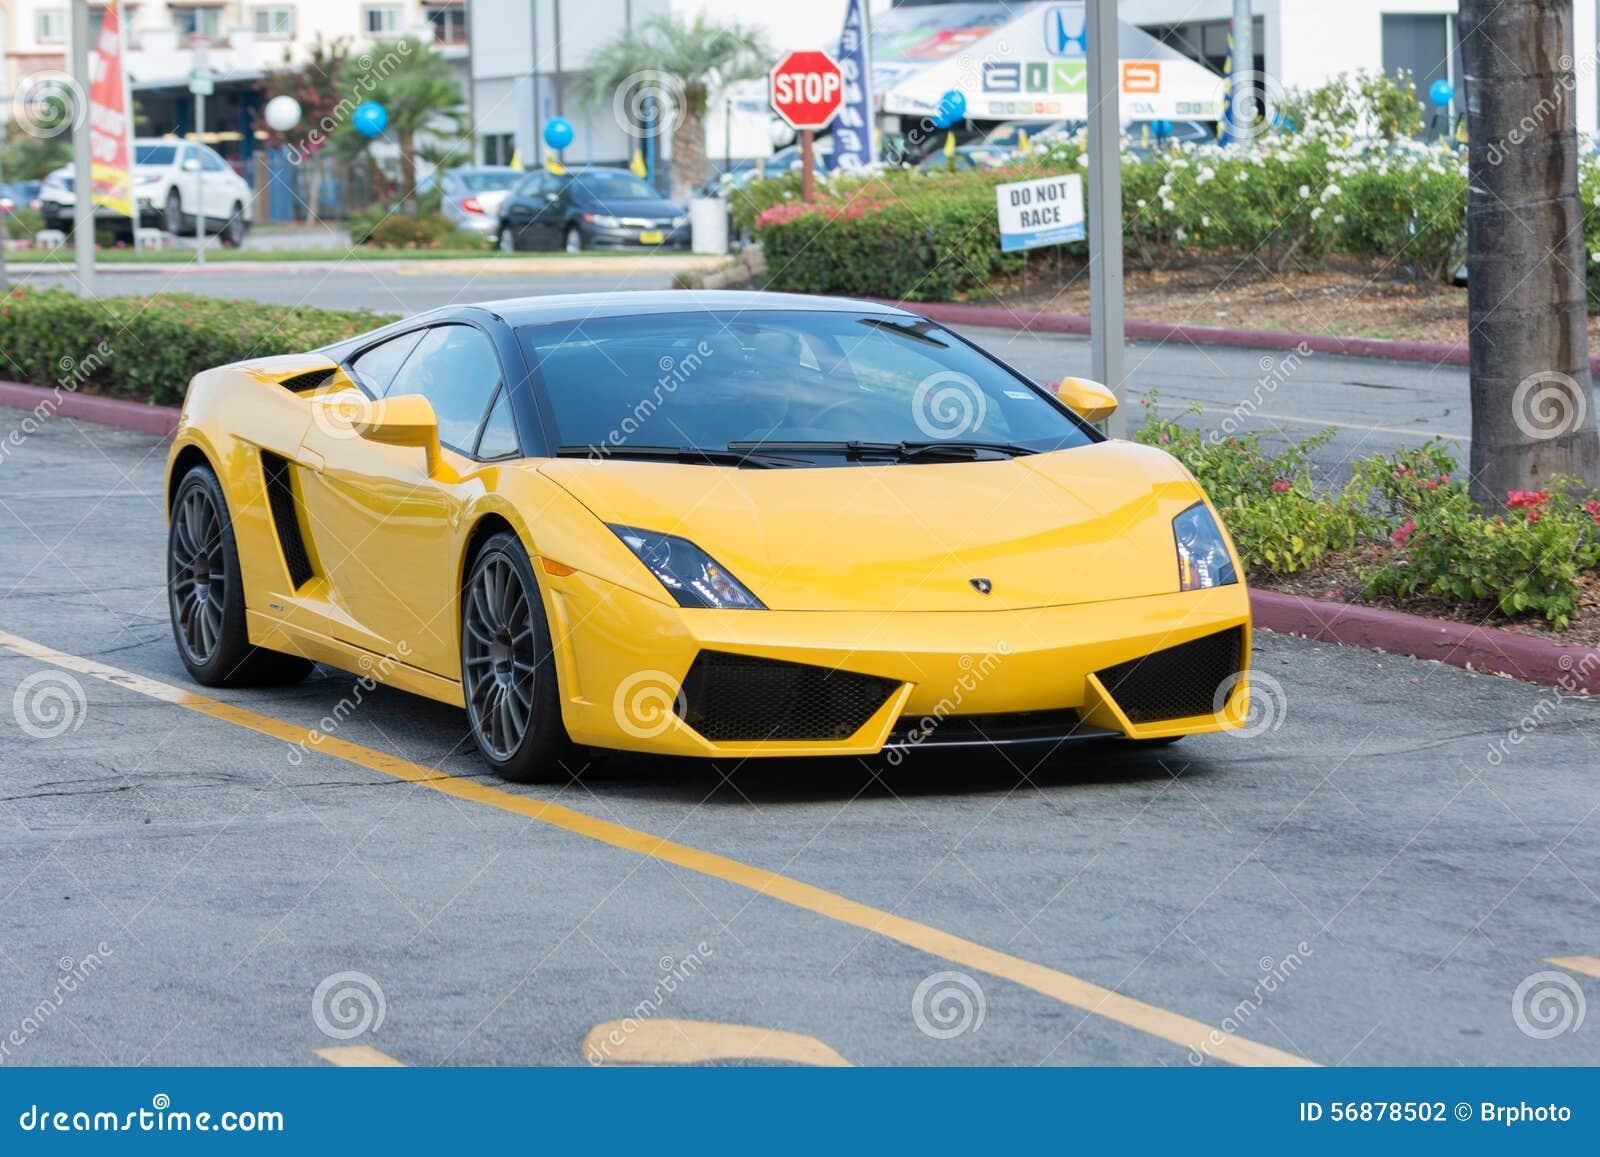 Lamborghini Gallardo samochód na pokazie